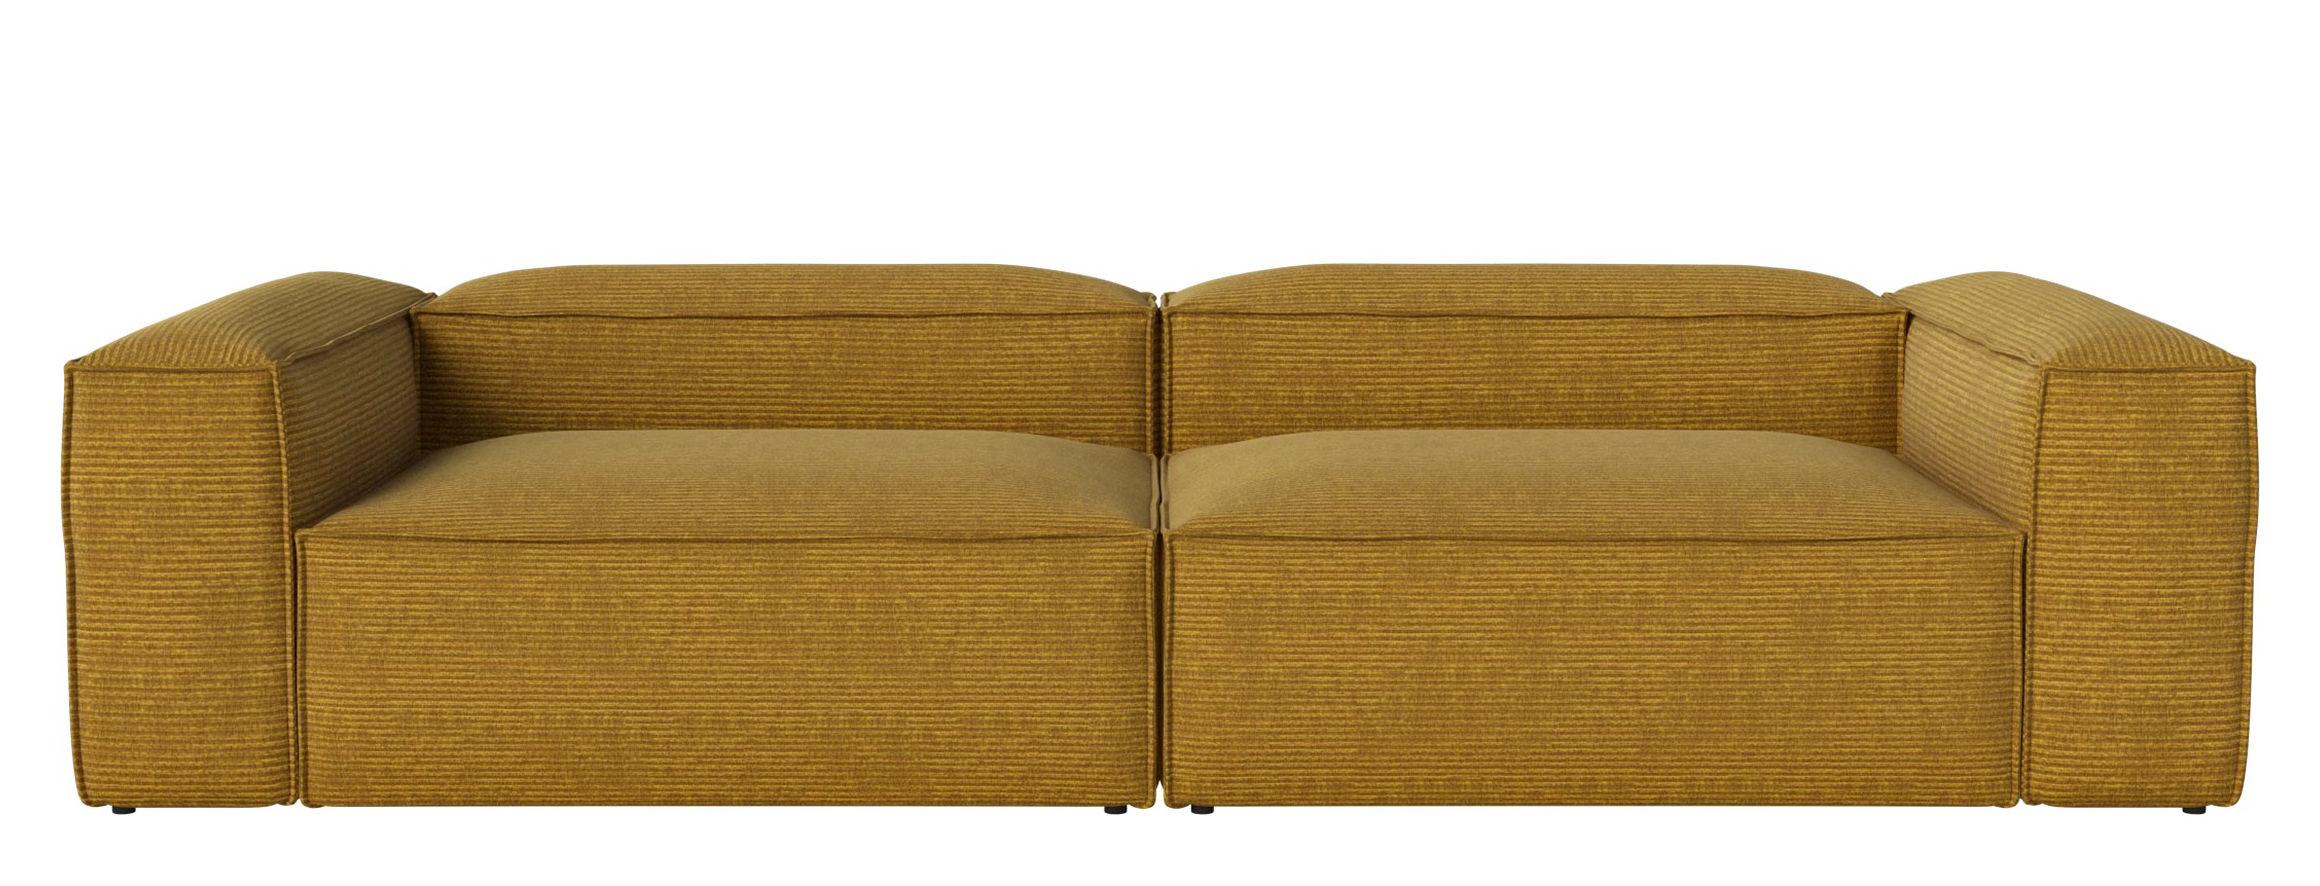 canap modulable cosima tissu 2 modules grand angle l 300 cm jaune curry bolia made in. Black Bedroom Furniture Sets. Home Design Ideas